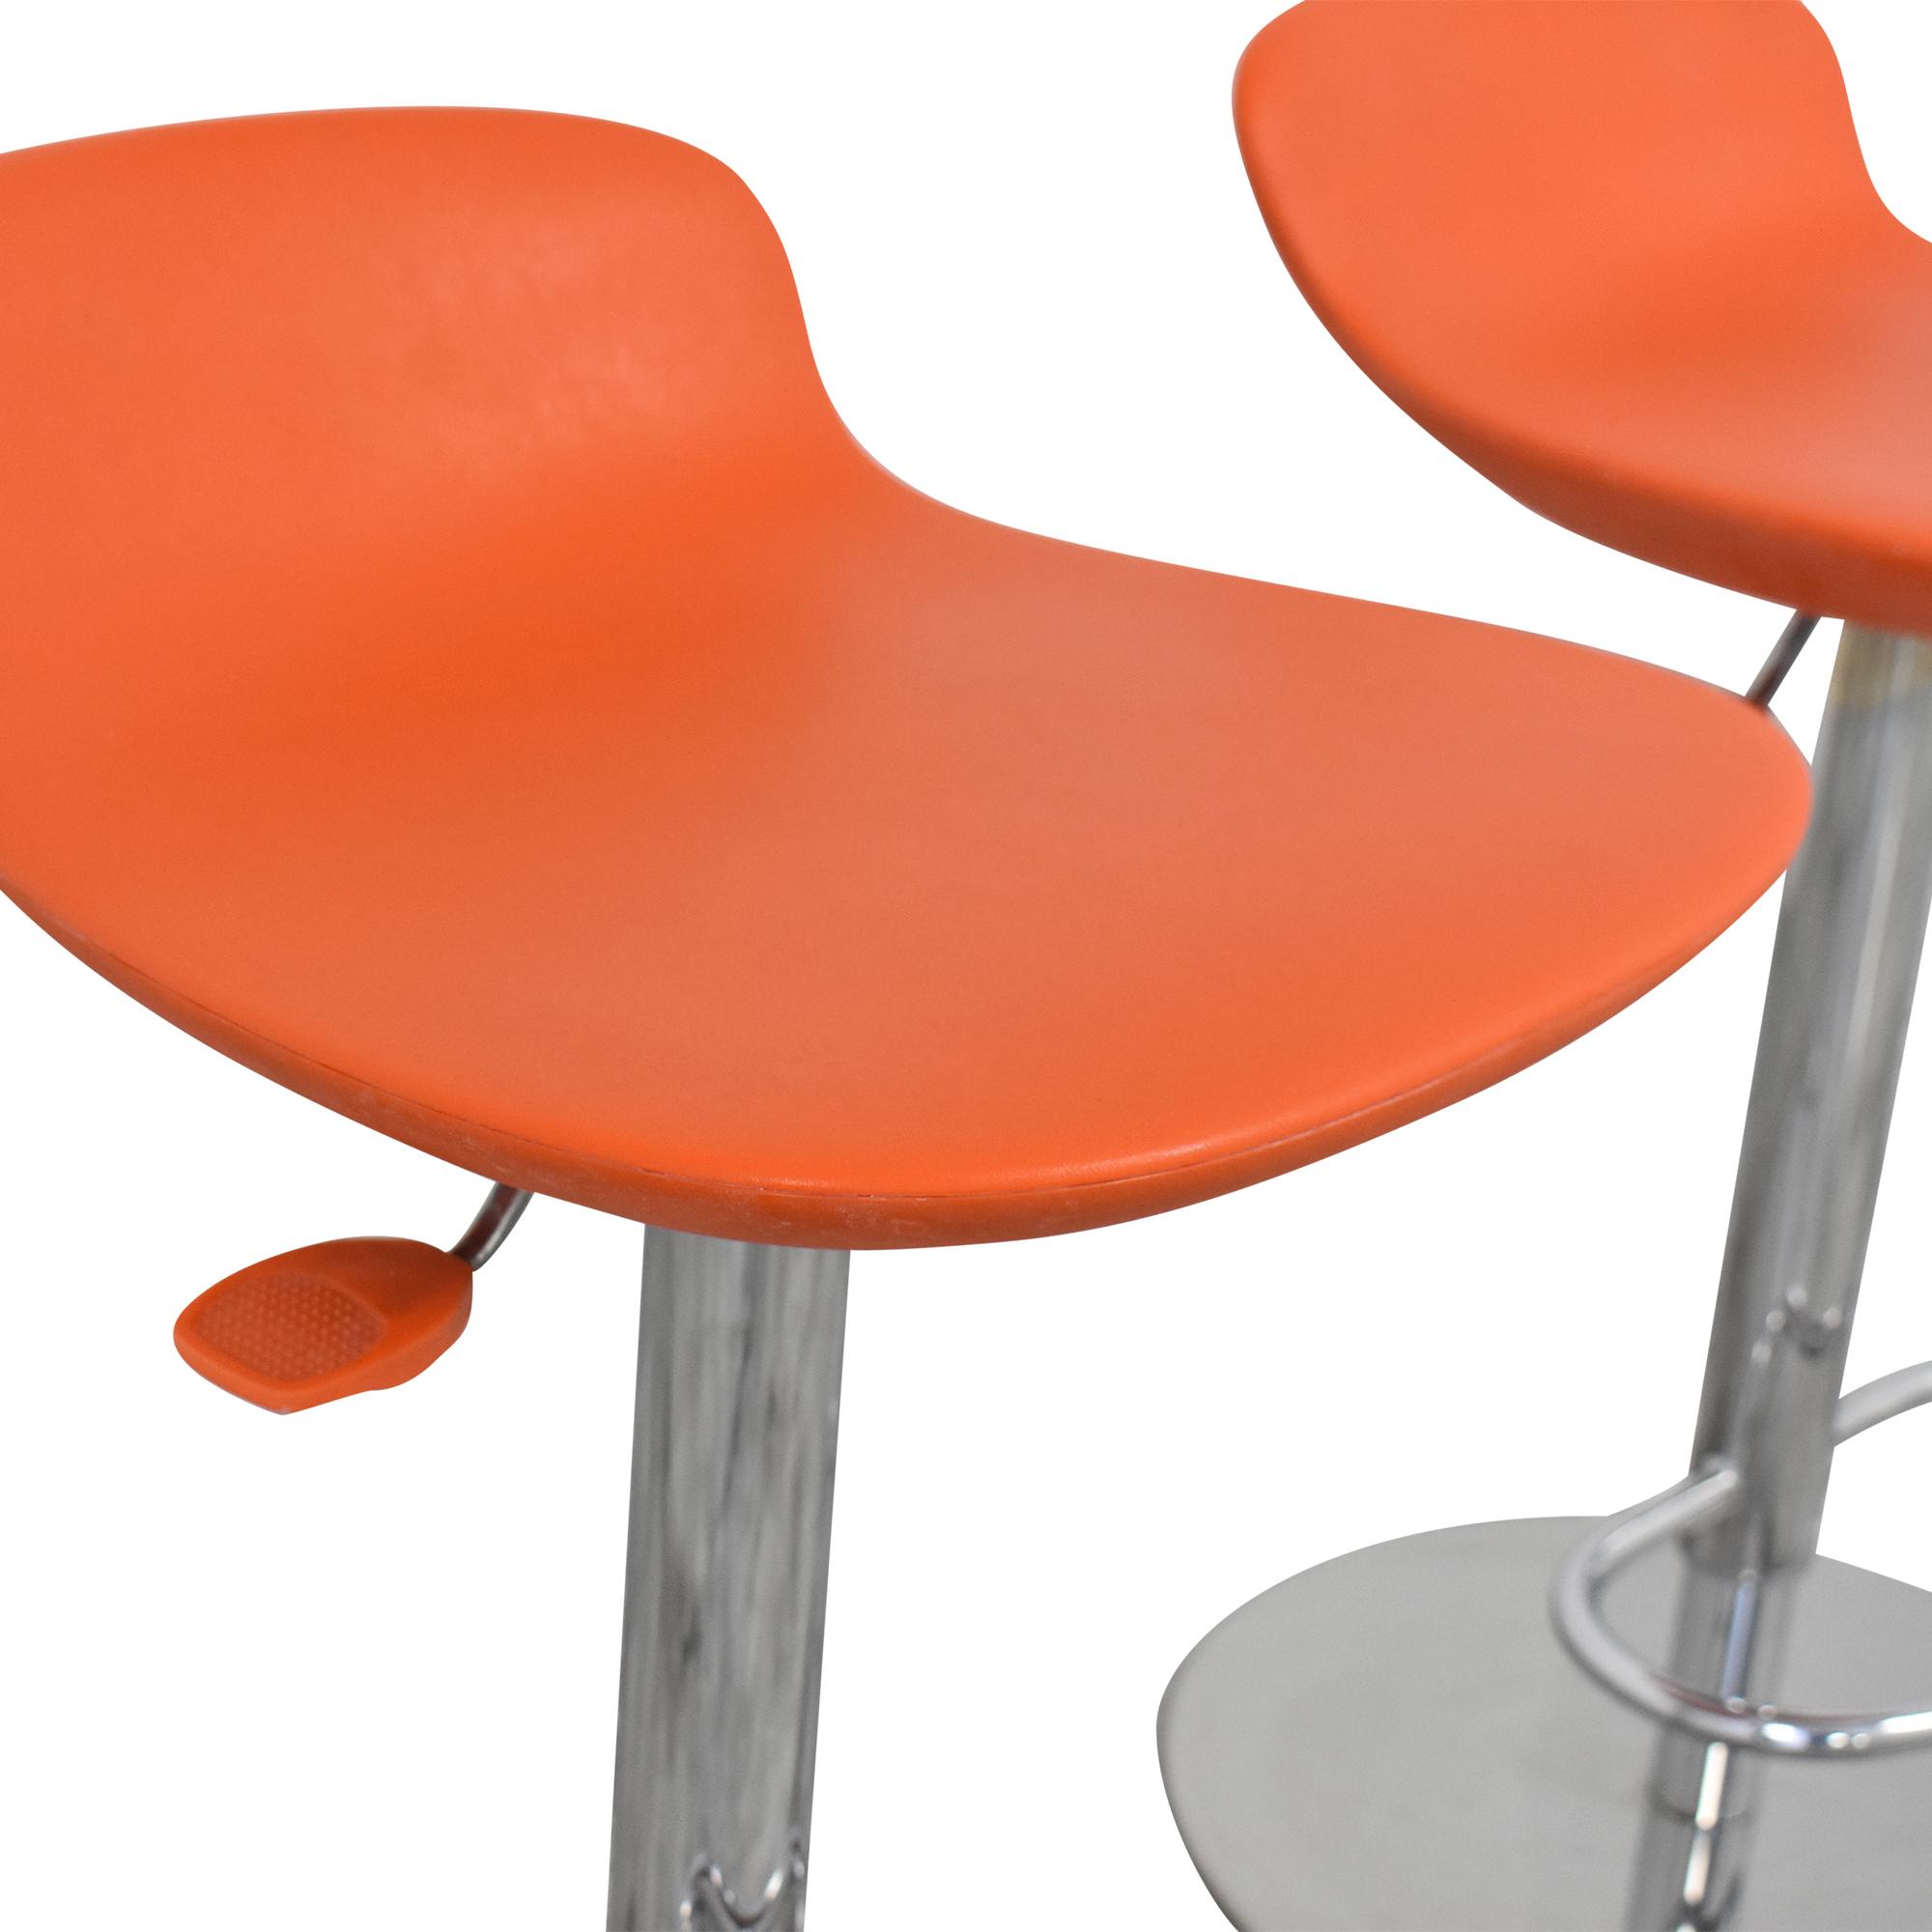 Room & Board Room & Board Leo Swivel Stools price